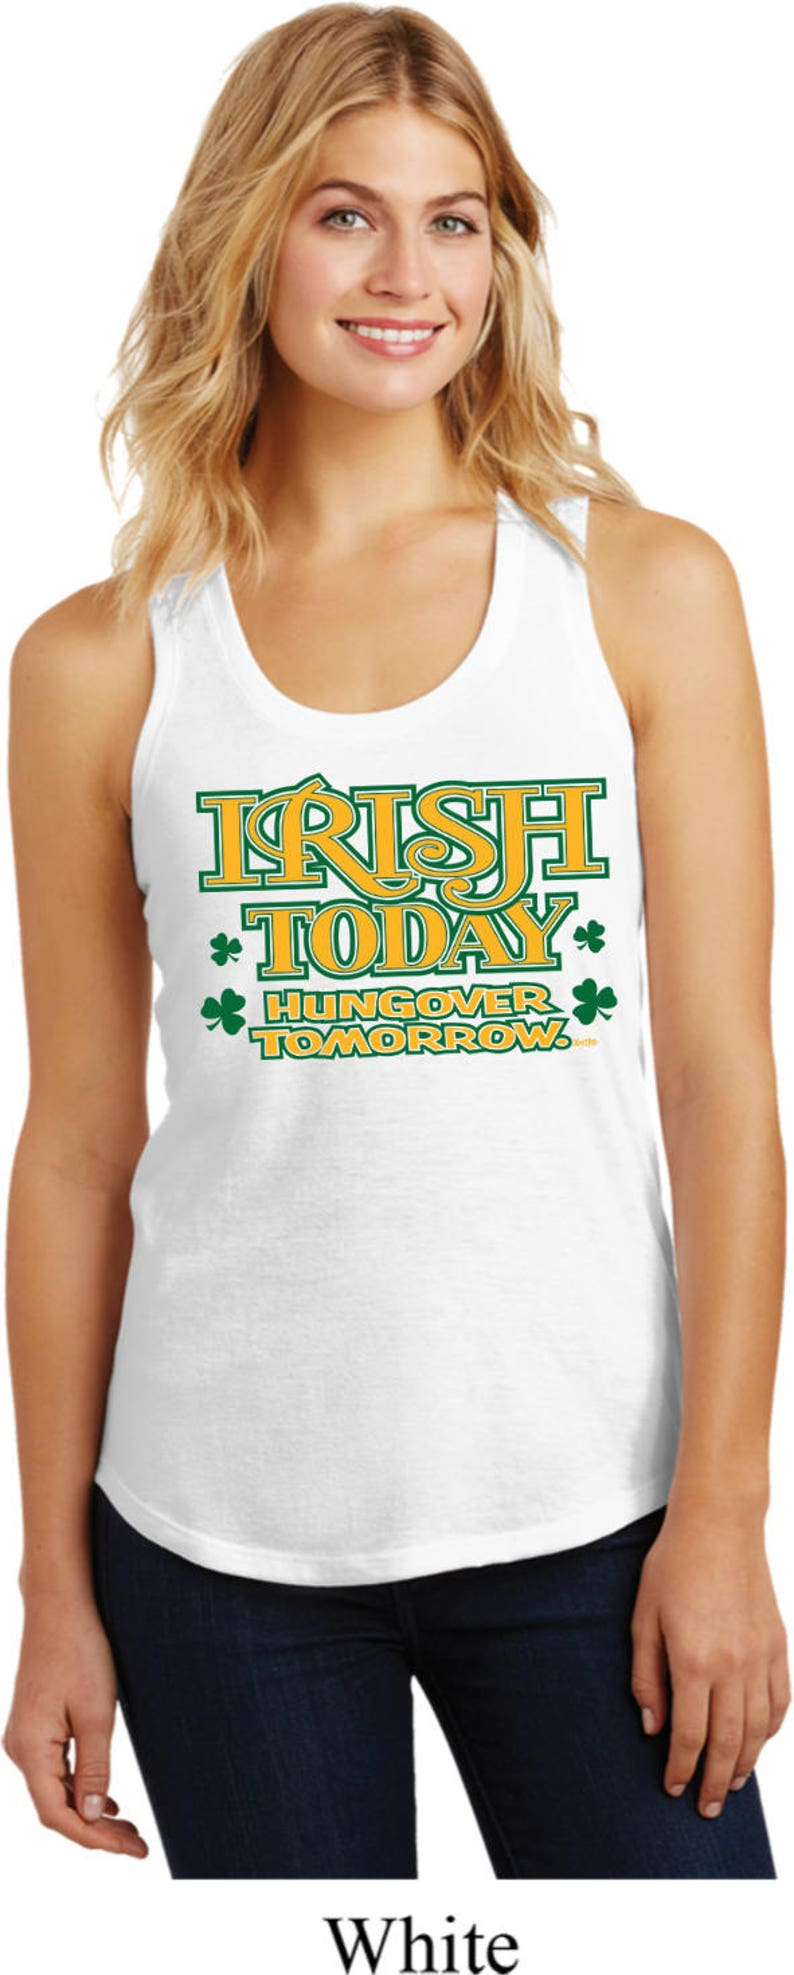 c04bd161ba8093 Ladies St Patrick s Day Tanktop Irish Today Hungover